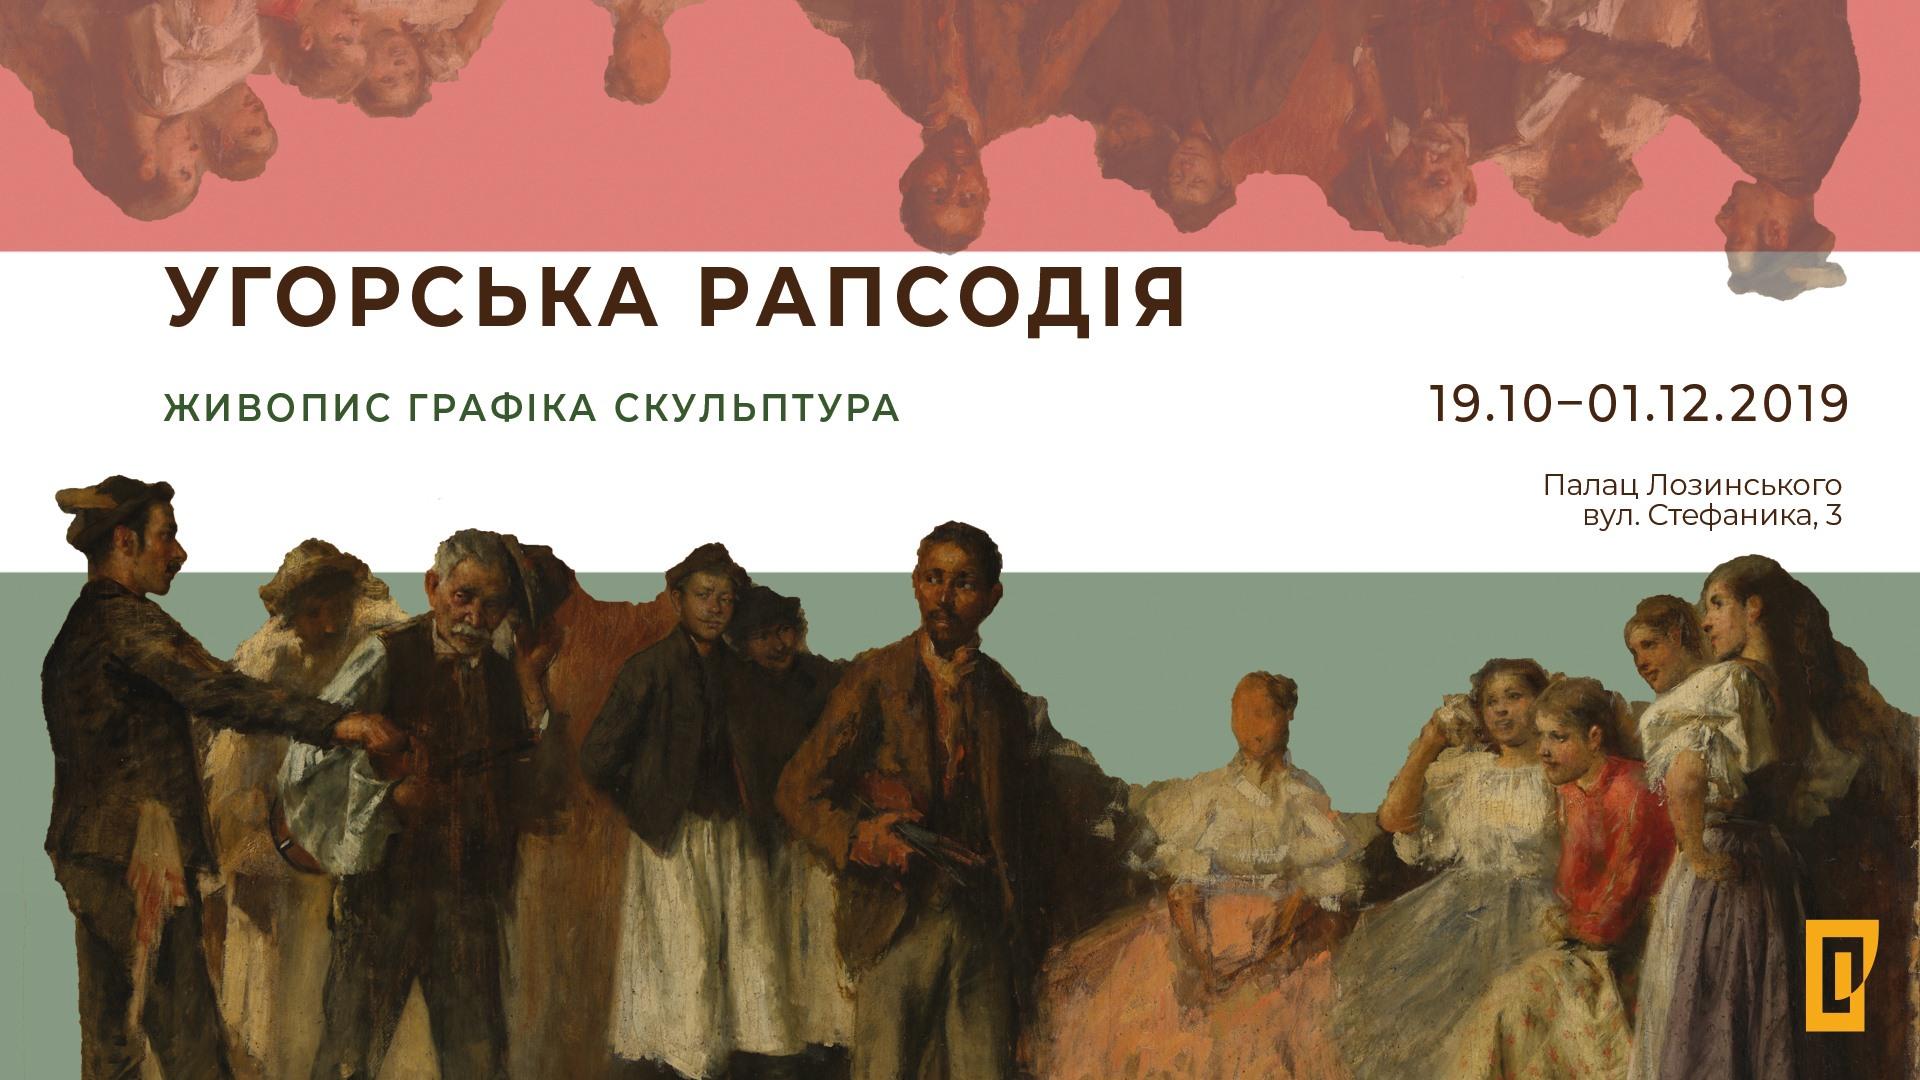 ugorska_rapsodiya_1.jpg (331.2 Kb)